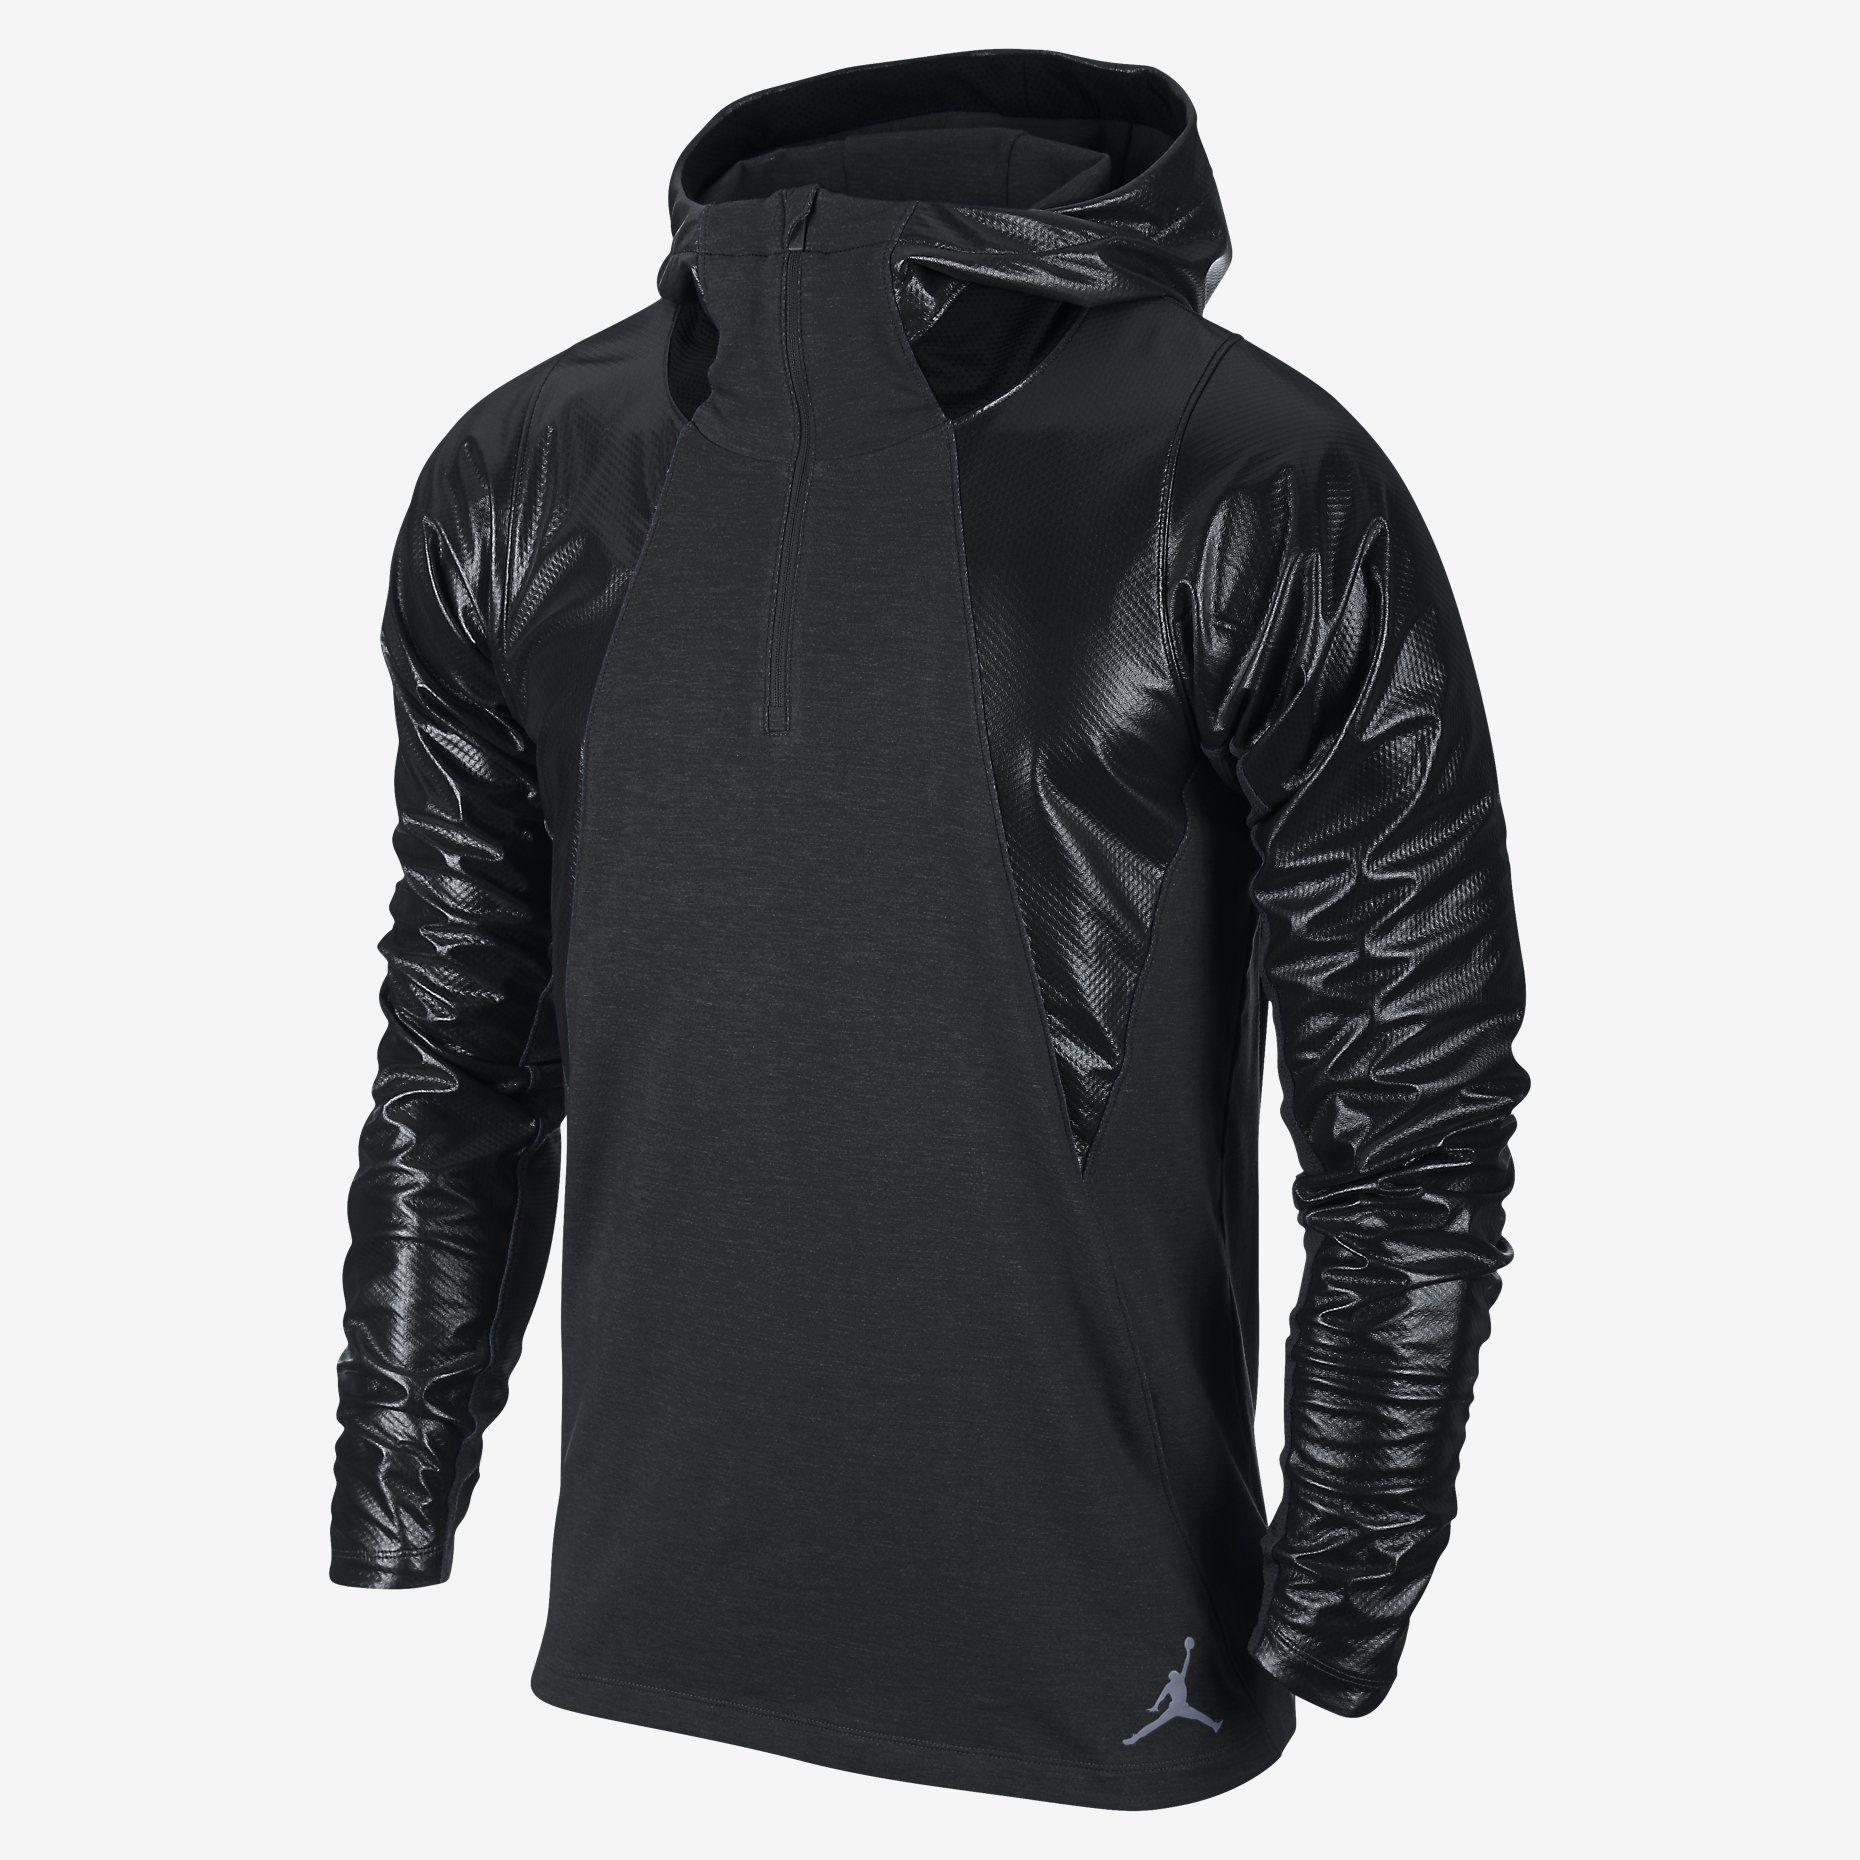 20853483b7e04 Air Jordan Stay Warm Fitted Shield Men s Hoodie. Nike.com